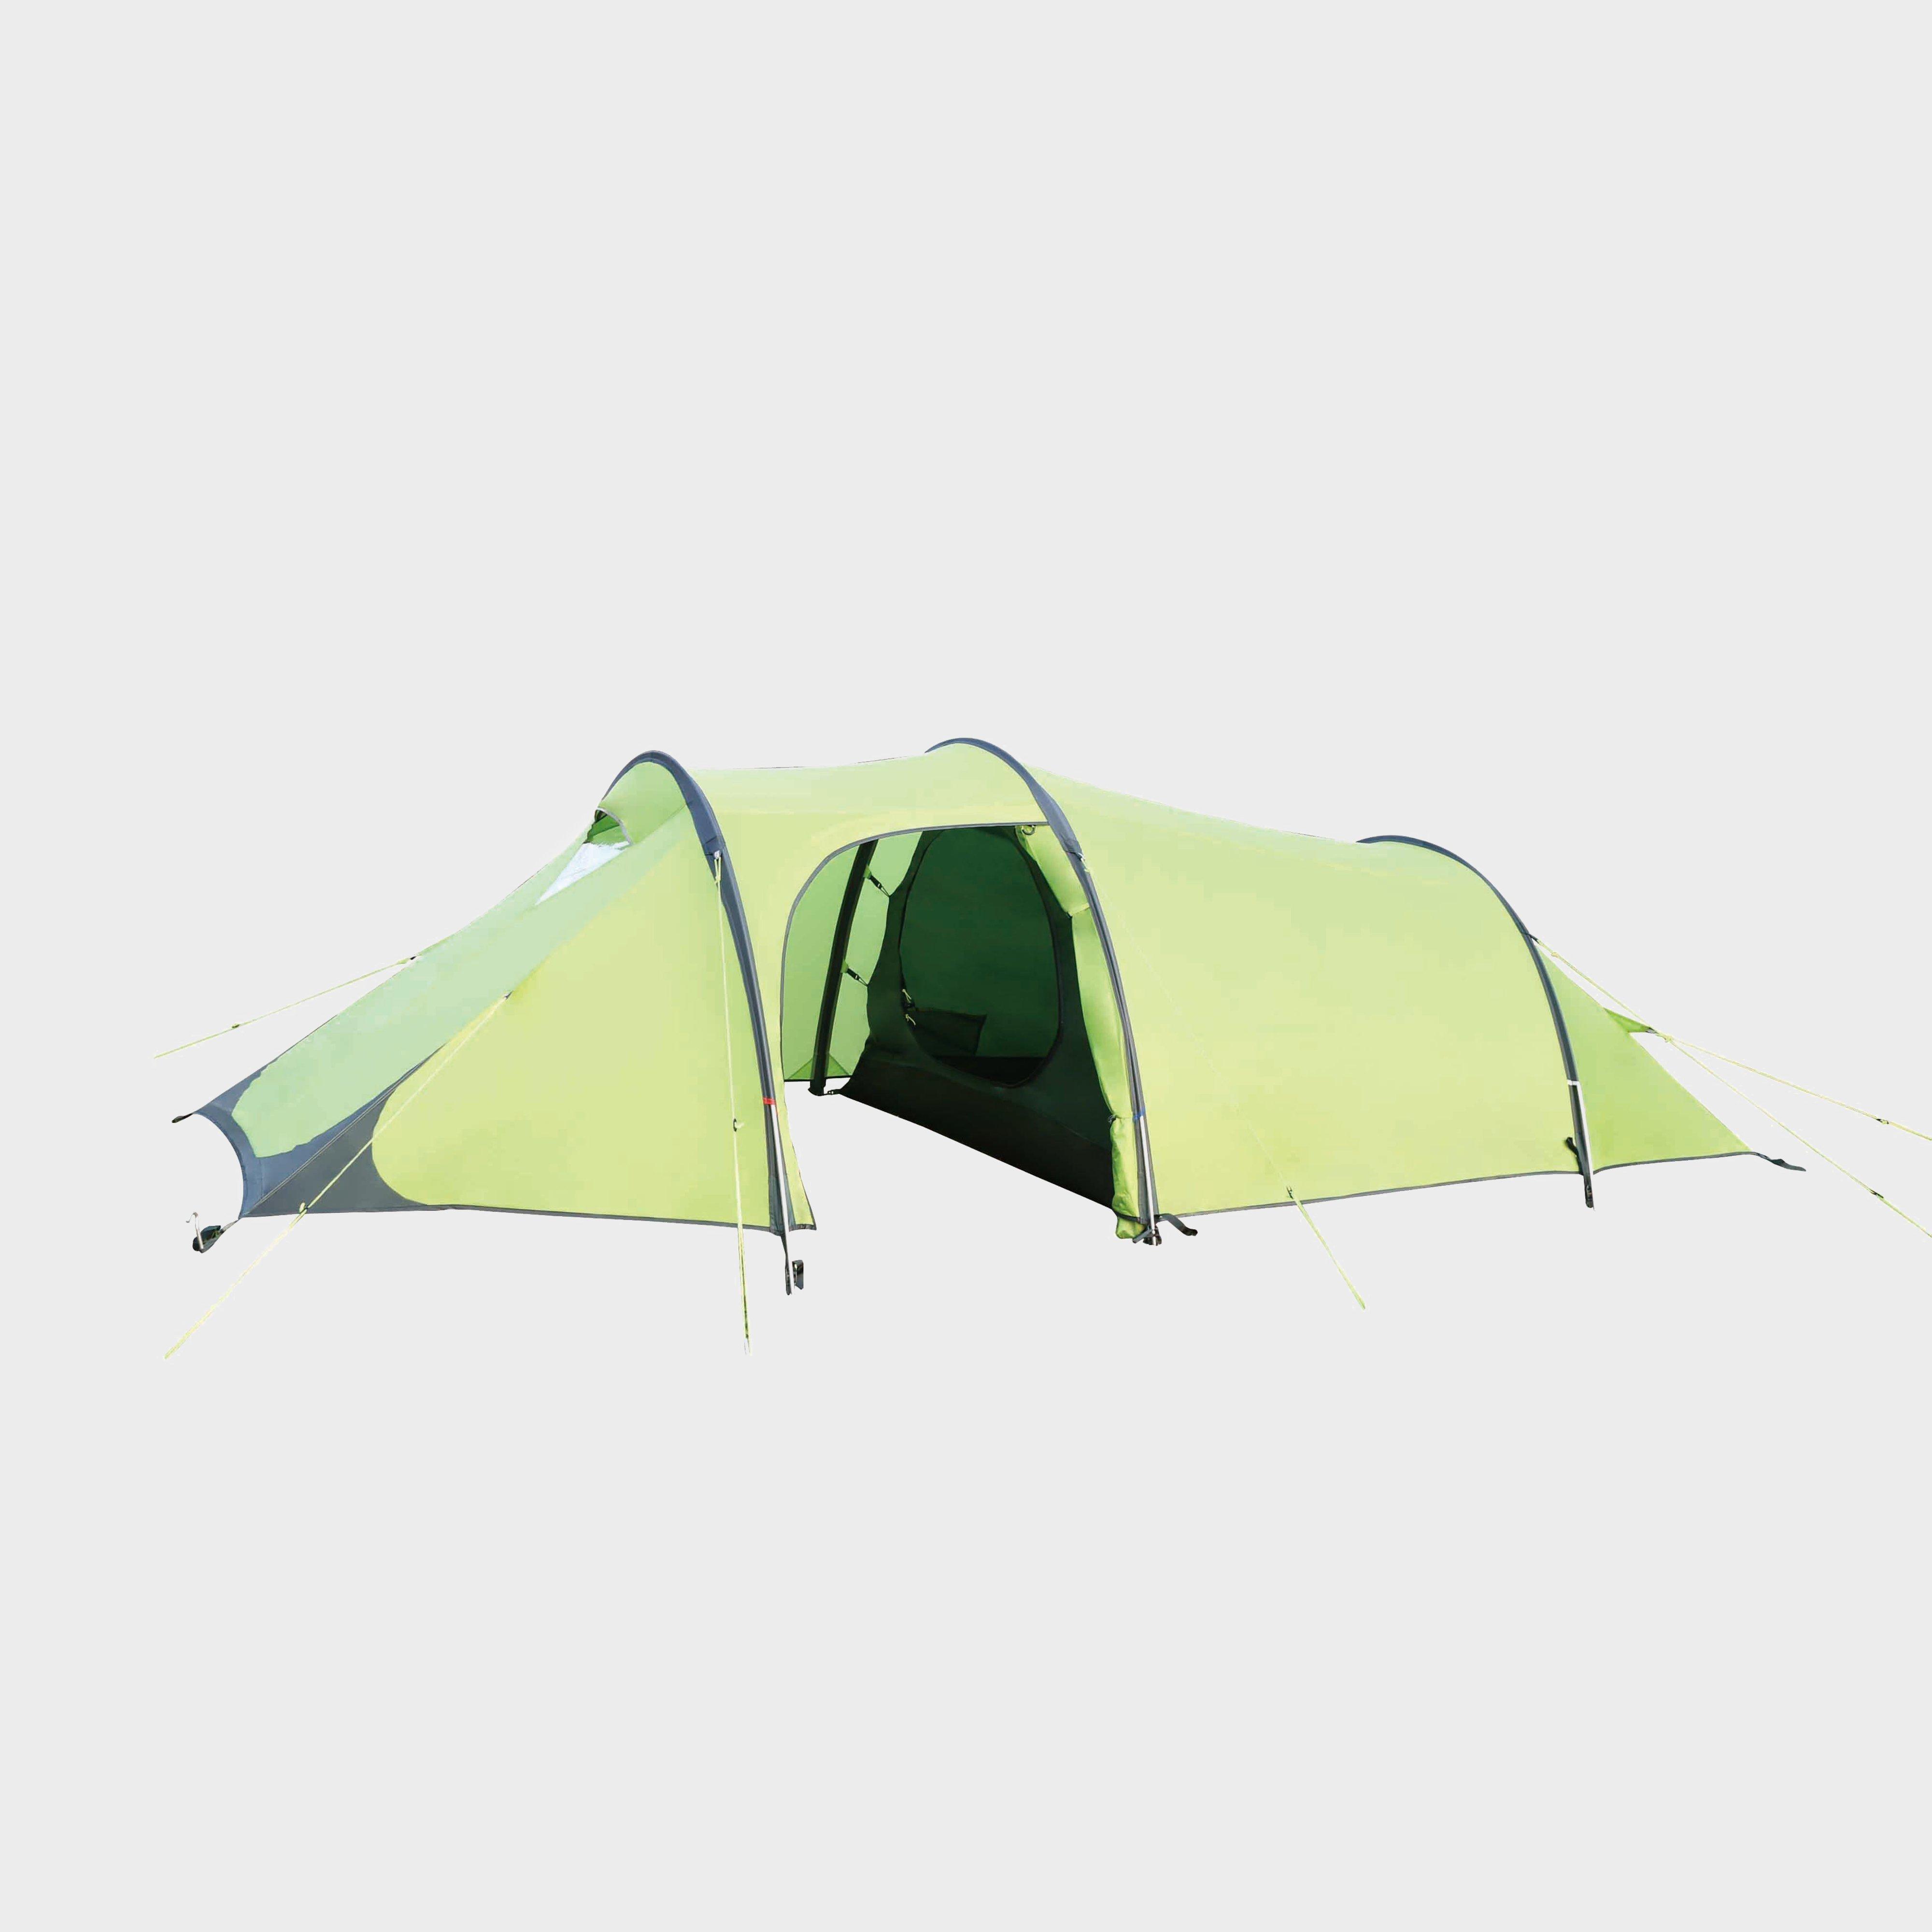 BERGHAUS Peak 3.3 Pro Tent  sc 1 st  Millets & Tents | Family Backpacking u0026 Festival Tents | Millets